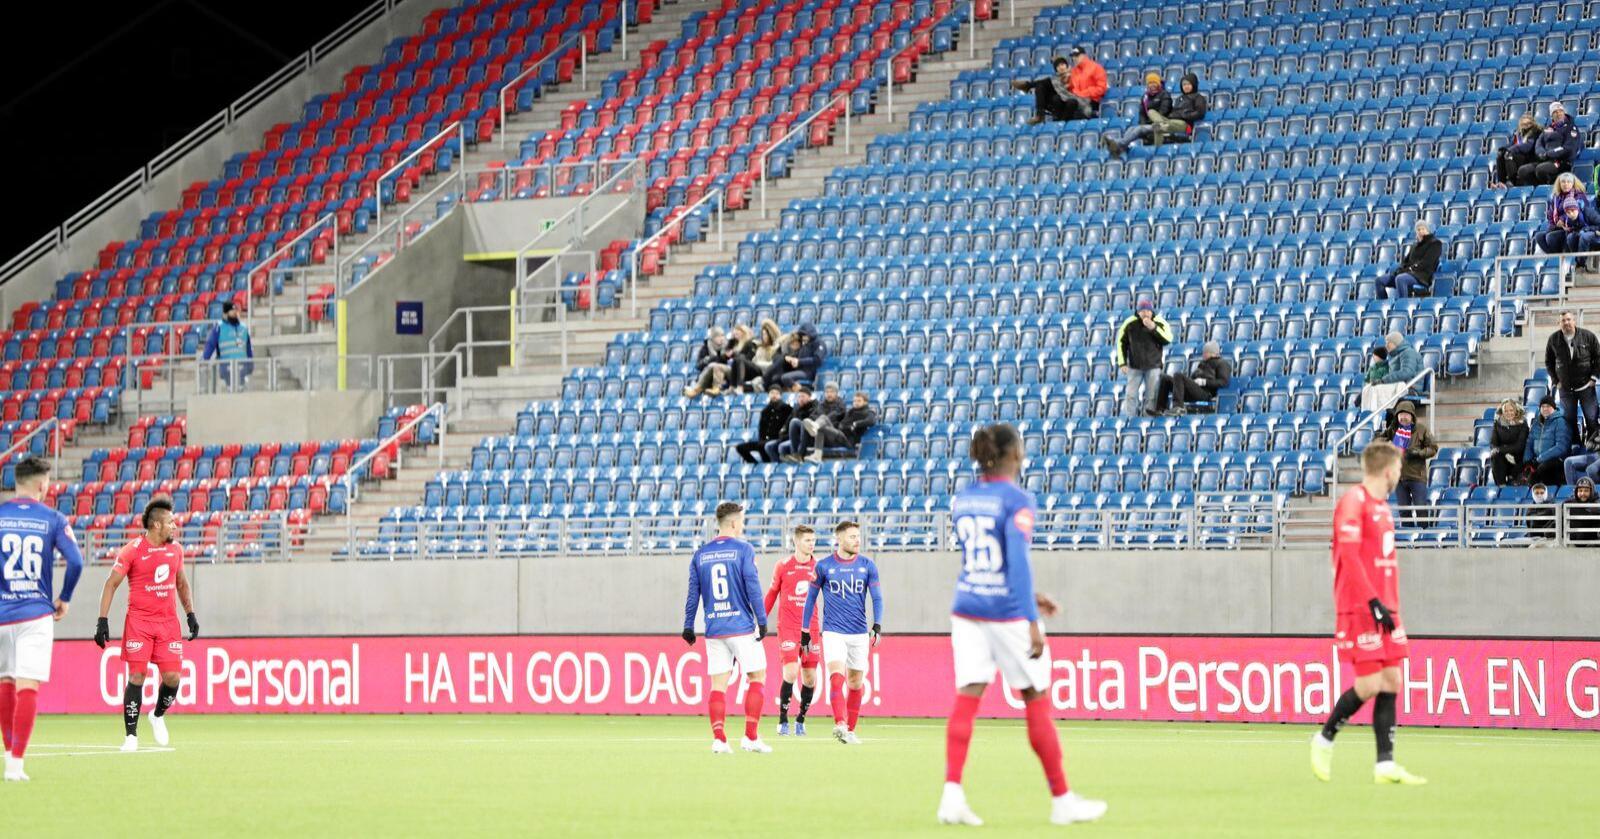 Tomme seter: Mange fotballkamper sliter med lave publikumstall. Foto: Berit Roald / NTB scanpix